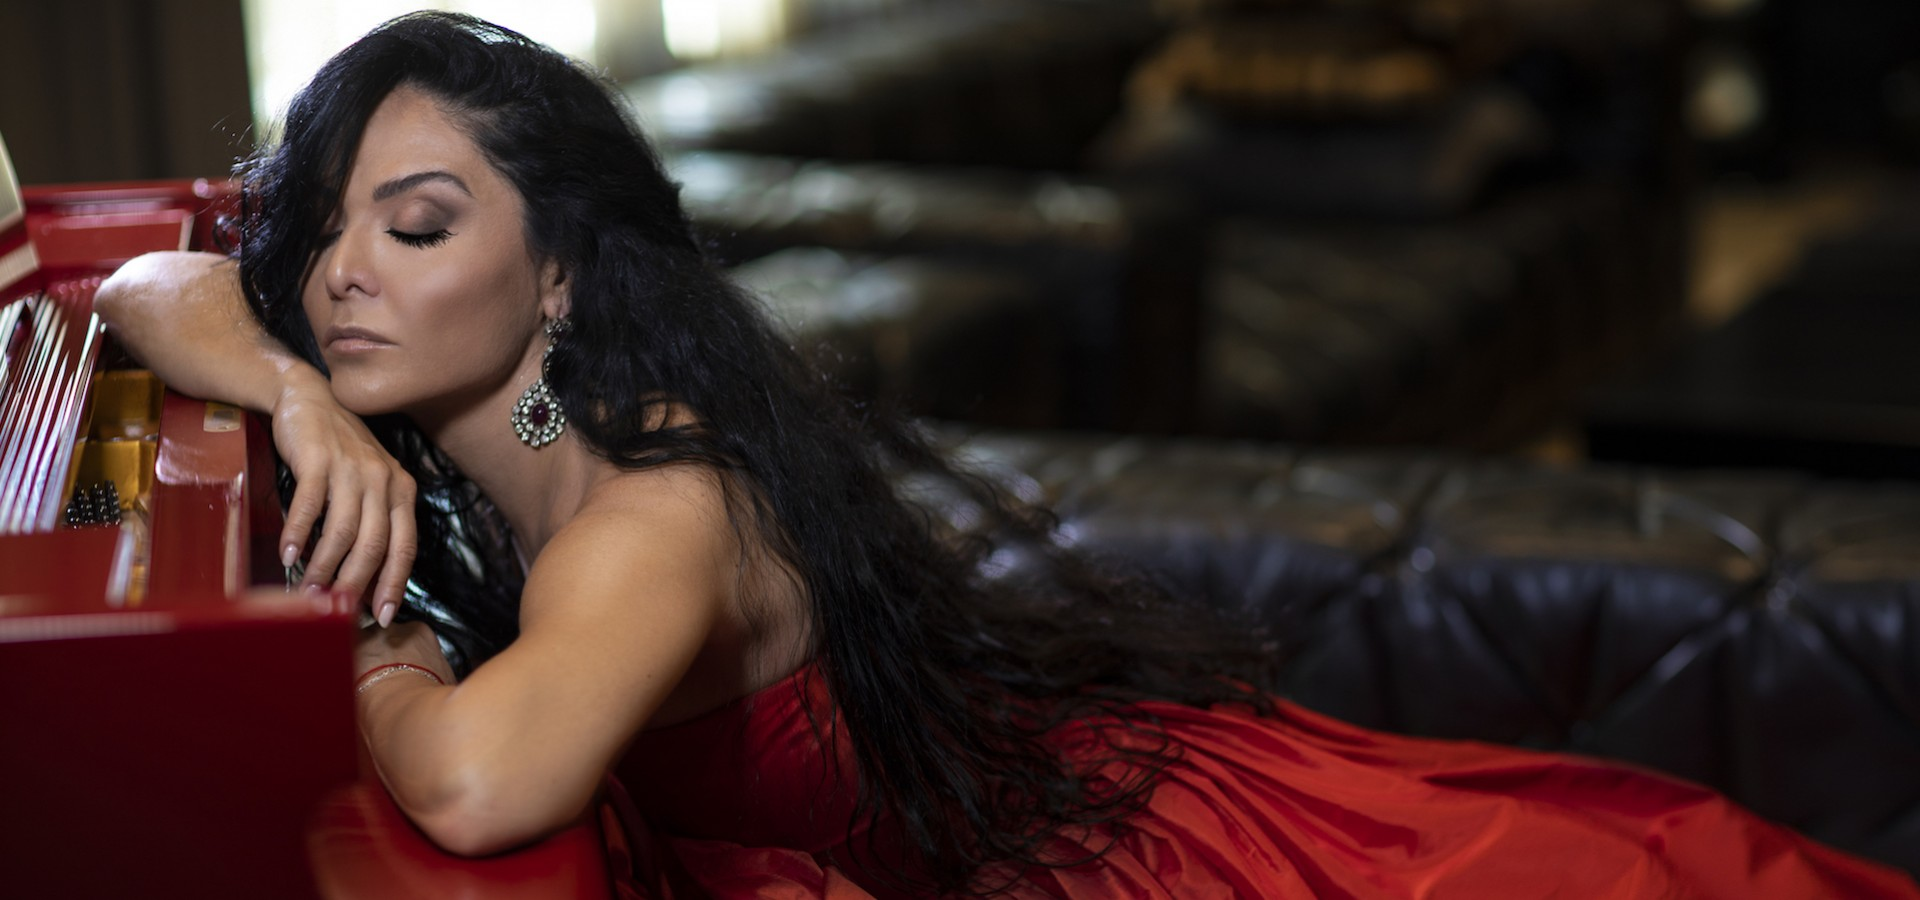 Миранда Мирианашвили. Риад Маммадов. Мир без границ. Концерт в оранжерее ВДНХ фото